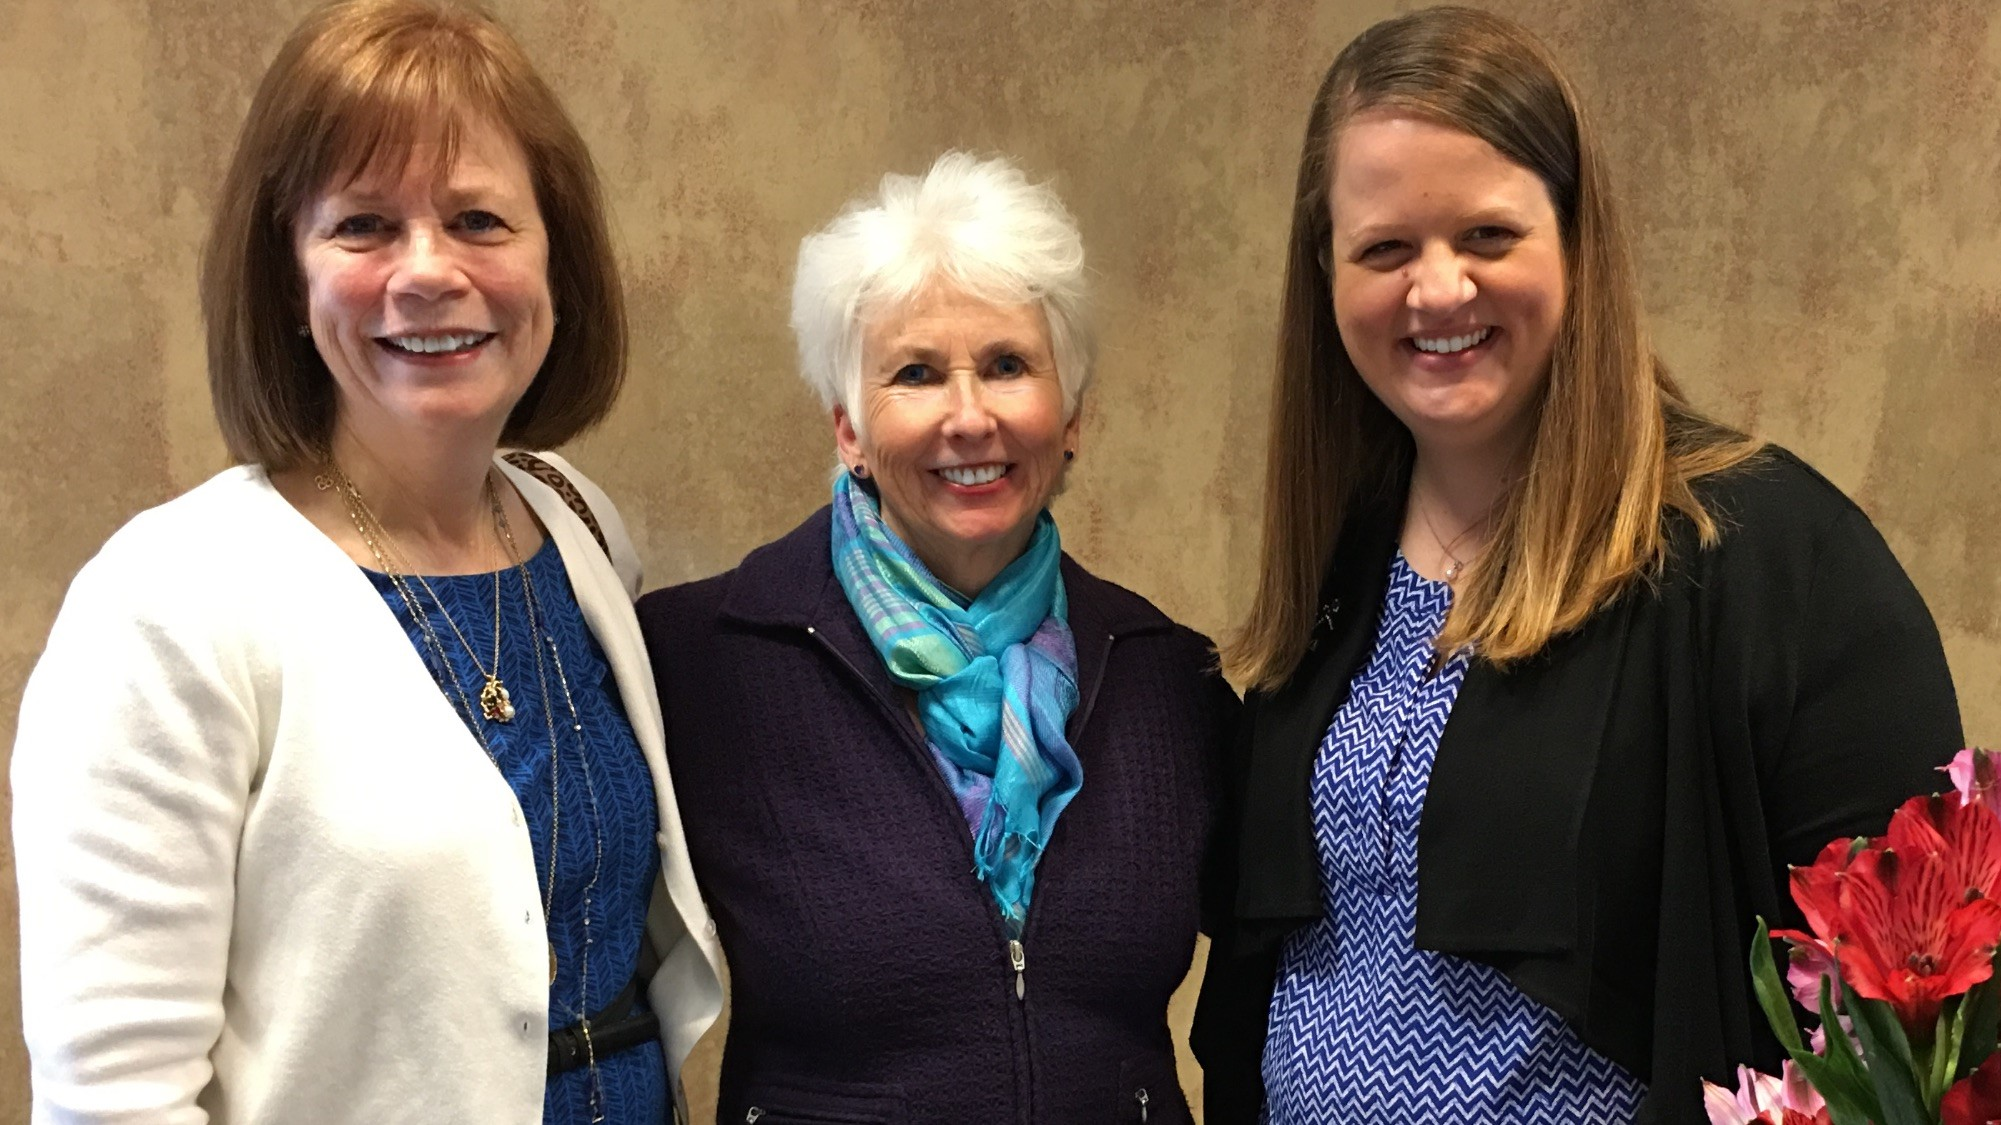 (left to right) Joan Barker, Topeka, Washburn and NONOSO Alumnae; Hon. Sally D. Pokorny, Lawrence, District Court Judge for the Kansas 7th Judicial District, Washburn Alumnae and newly inducted NONOSO member; Sarah Towle, NONOSO Alumni President.